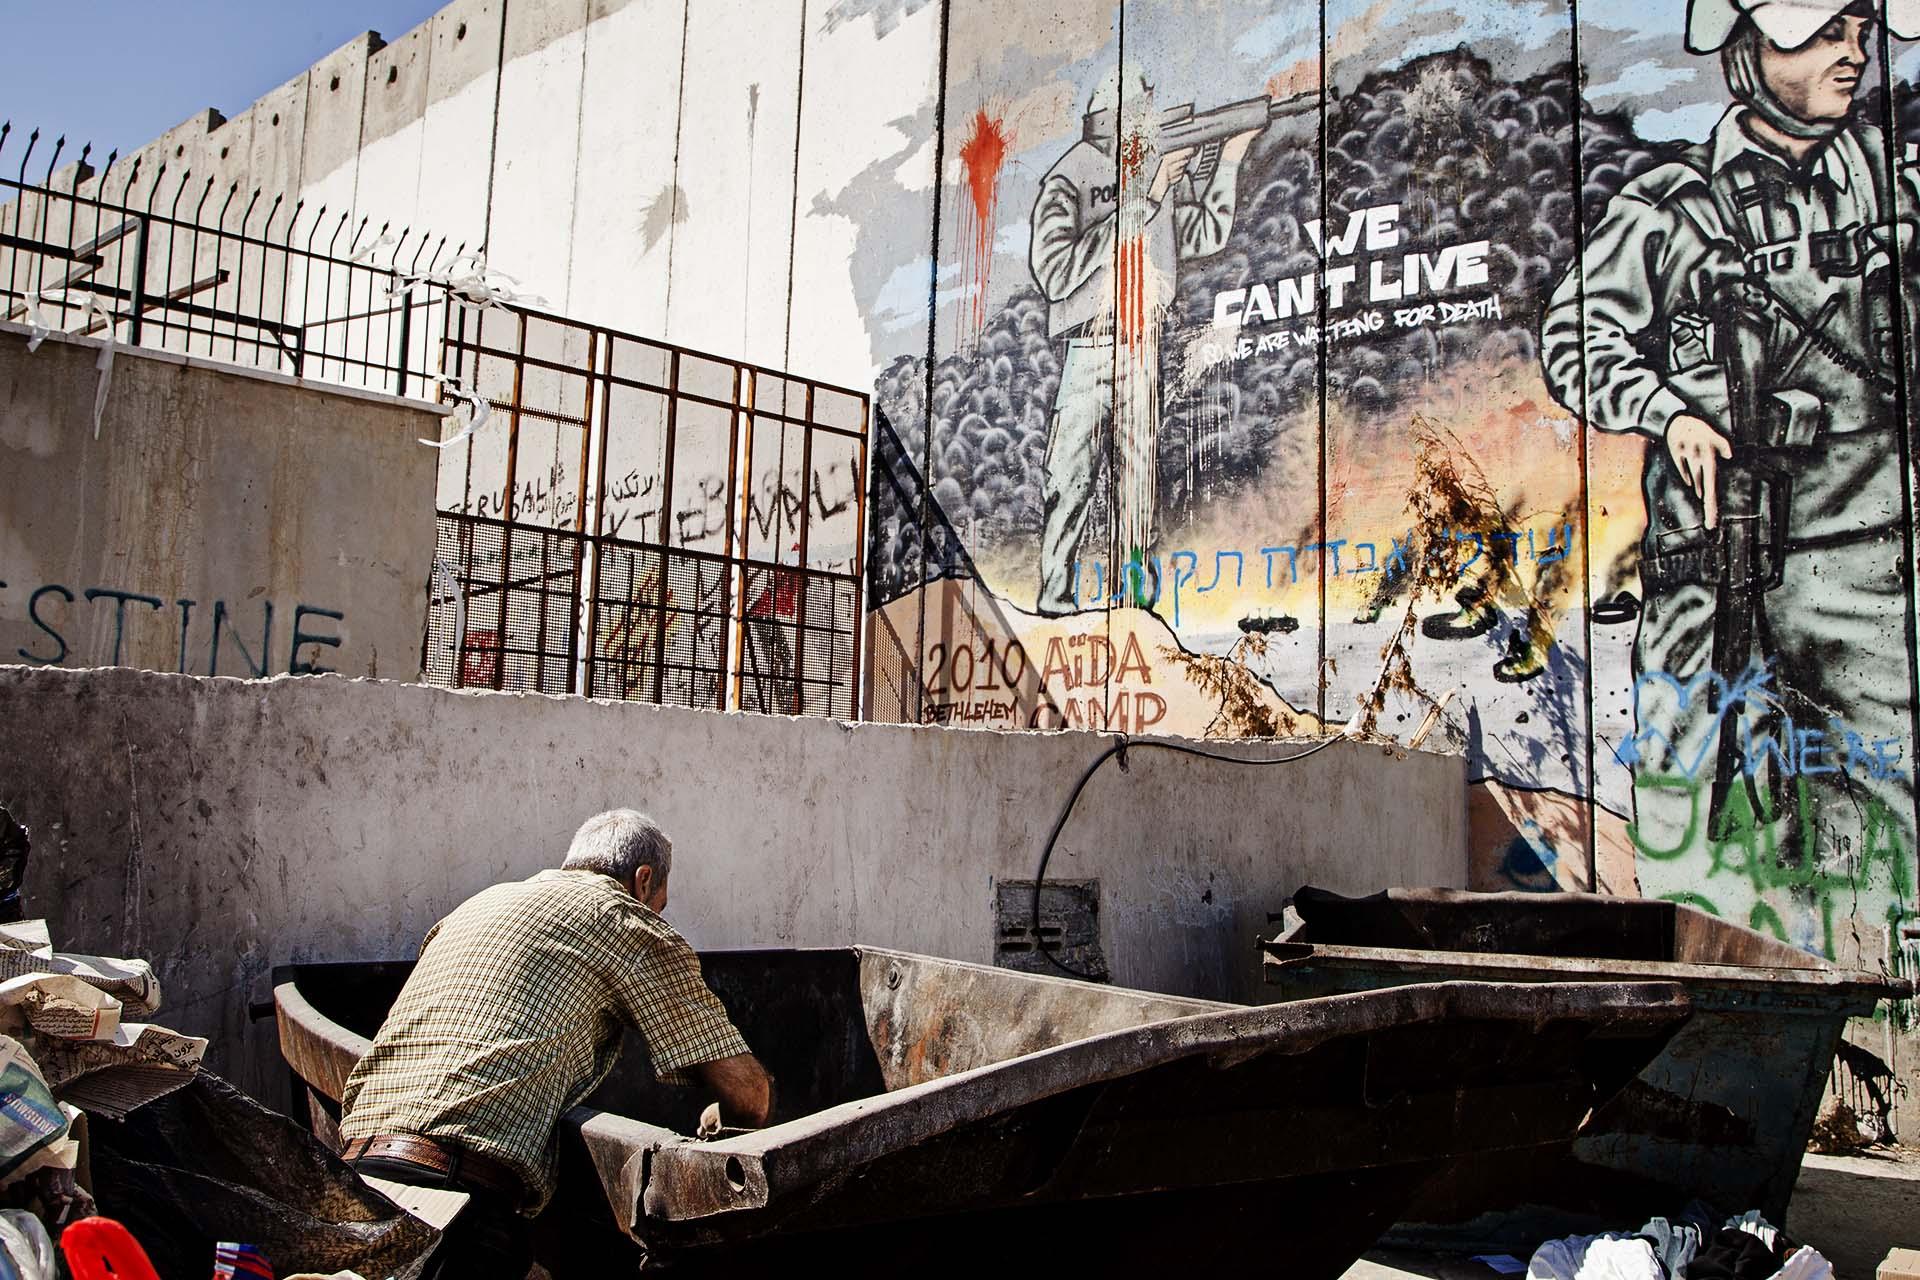 """No podemos vivir, por lo que estamos esperando a la muerte"". Campo de refugiados de Aïda."